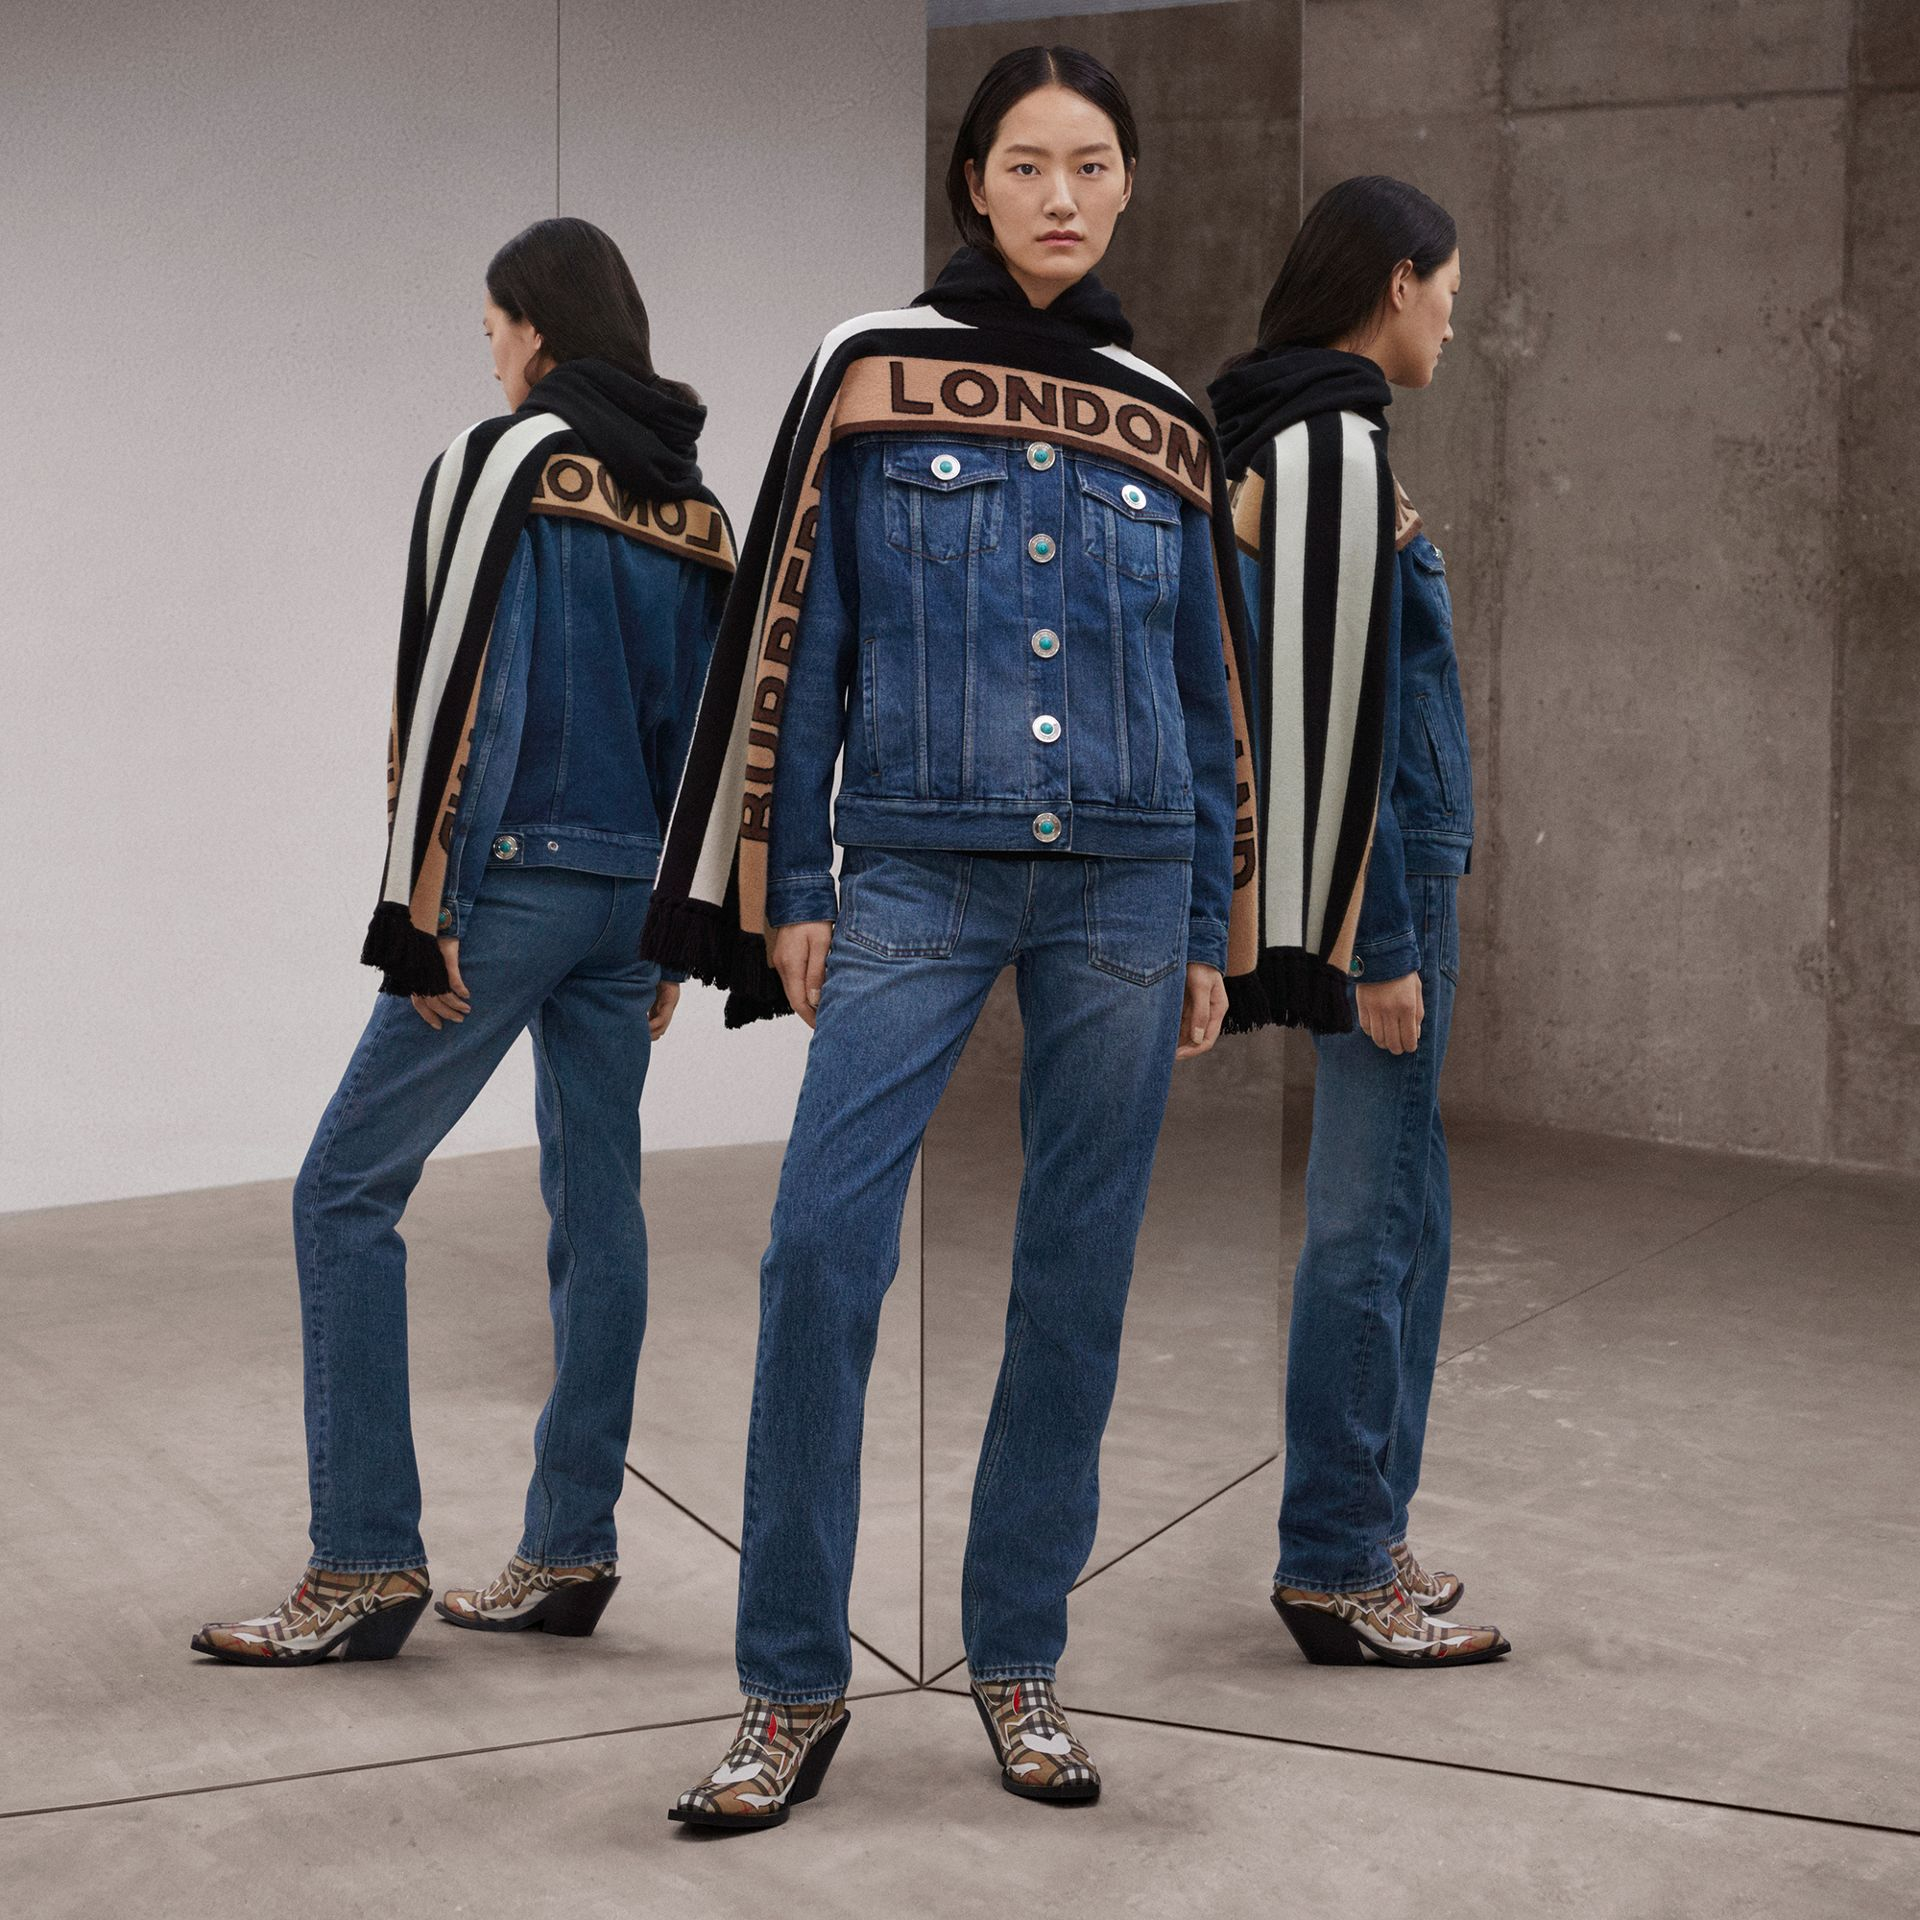 Logo Appliqué Reconstructed Denim Jacket in Indigo - Women | Burberry Singapore - gallery image 1